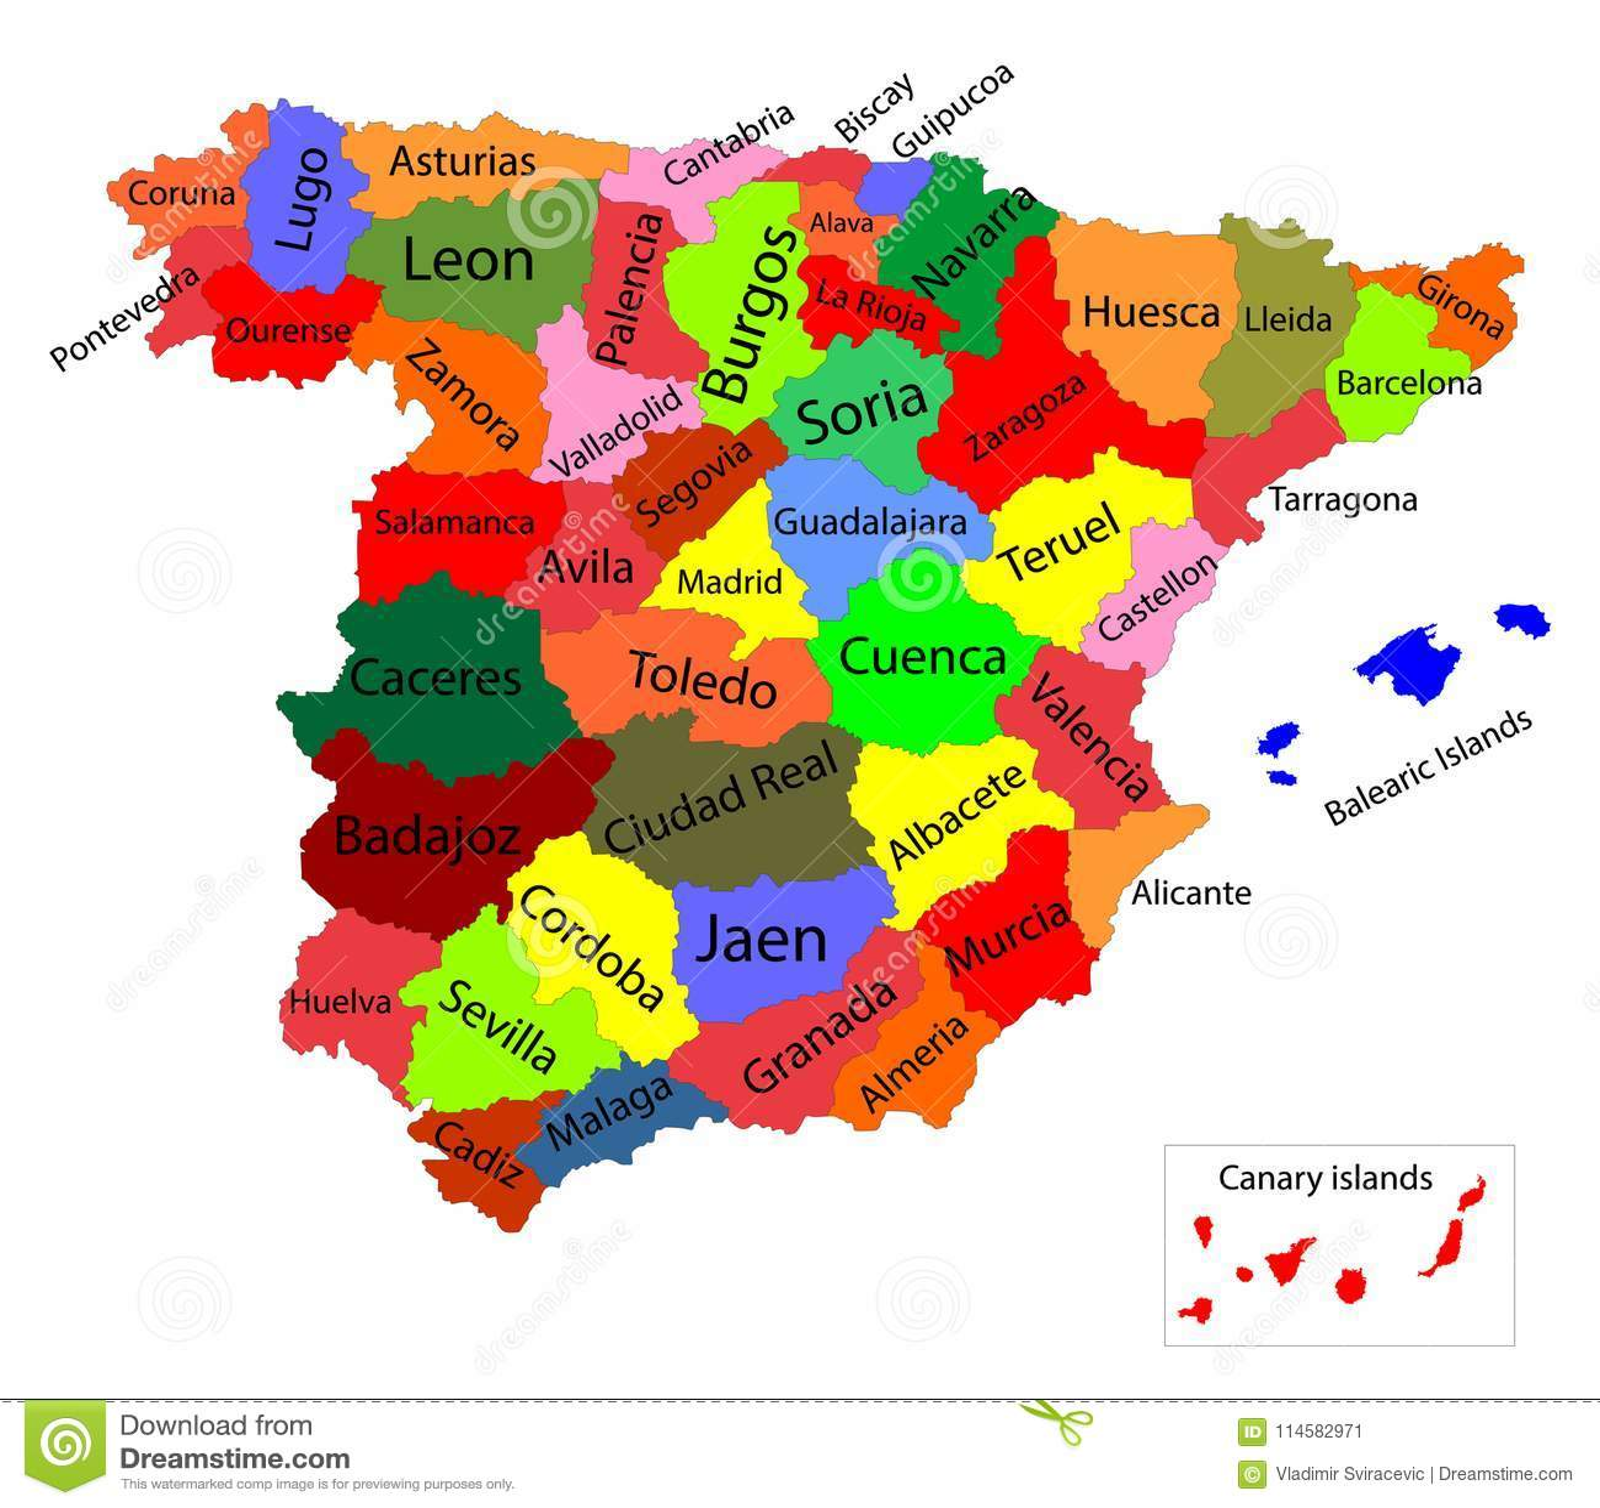 Mapa De España Provincias Y Comunidades.Mapa Colorido Editable De Espana Comunidades Autonomas De